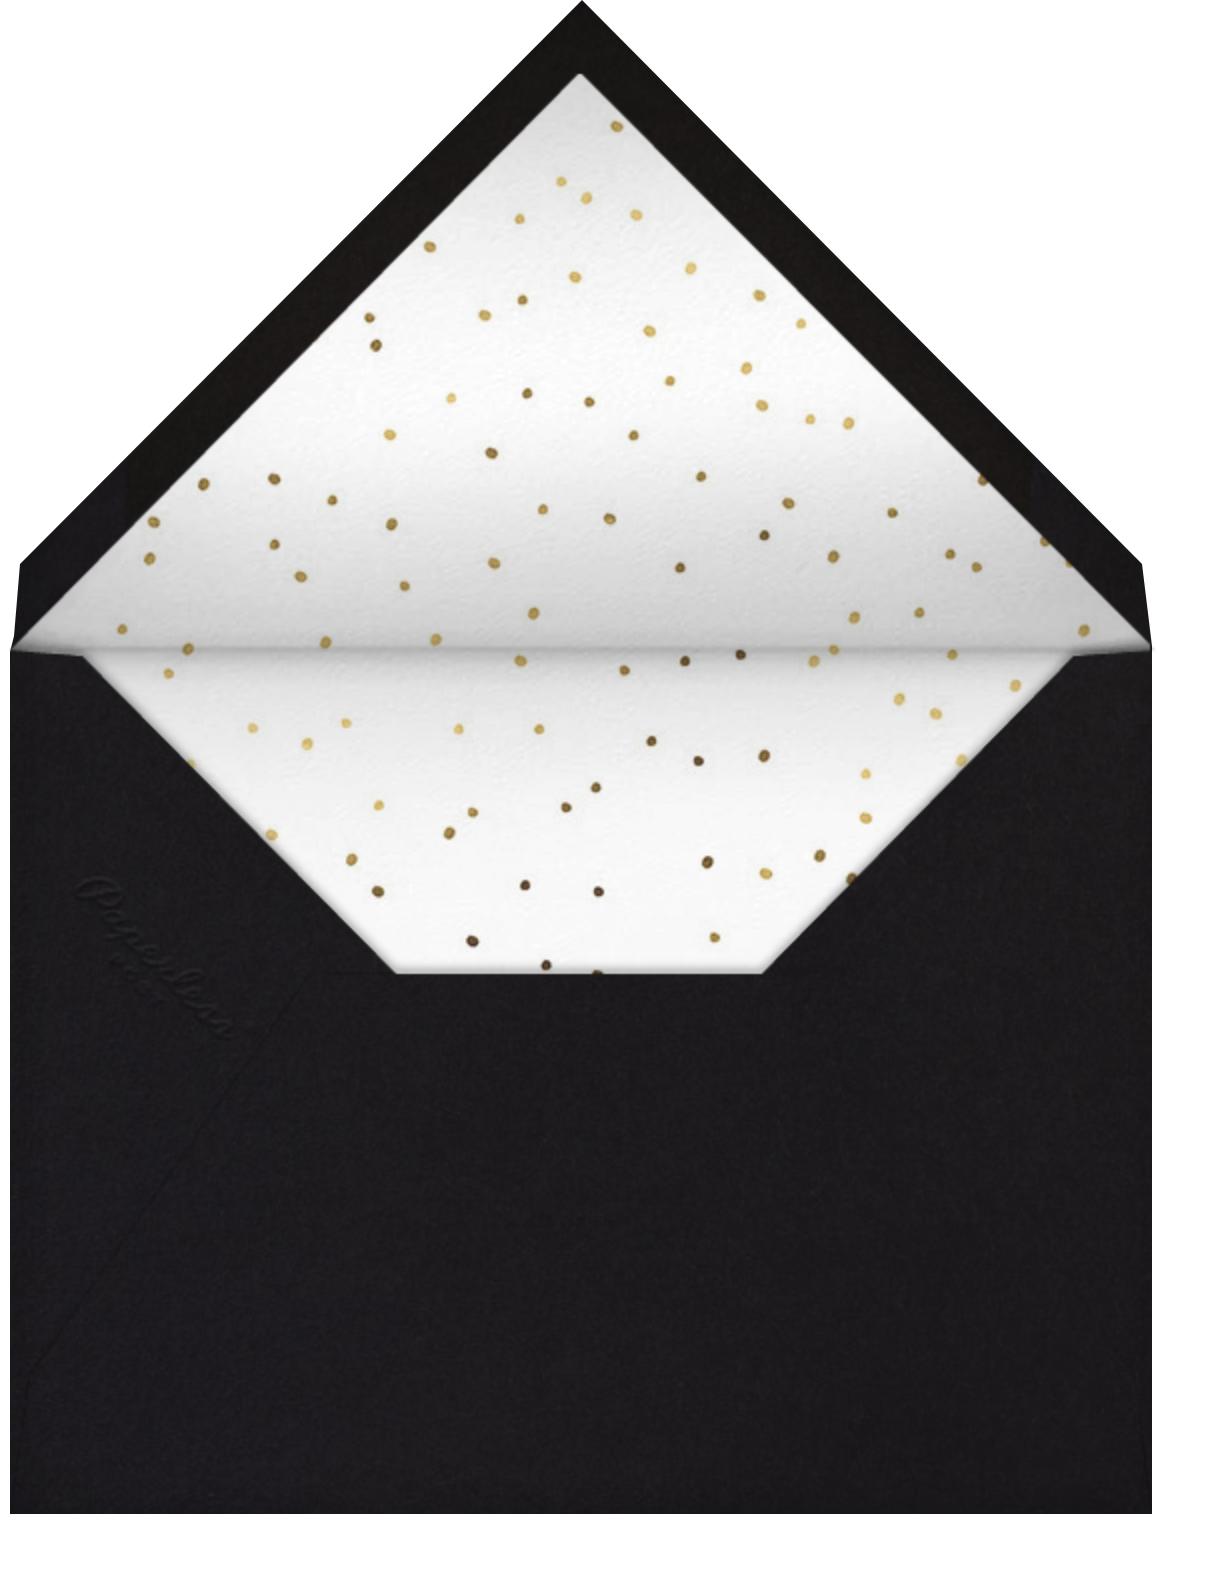 Uncorked - Mr. Boddington's Studio - Winter parties - envelope back